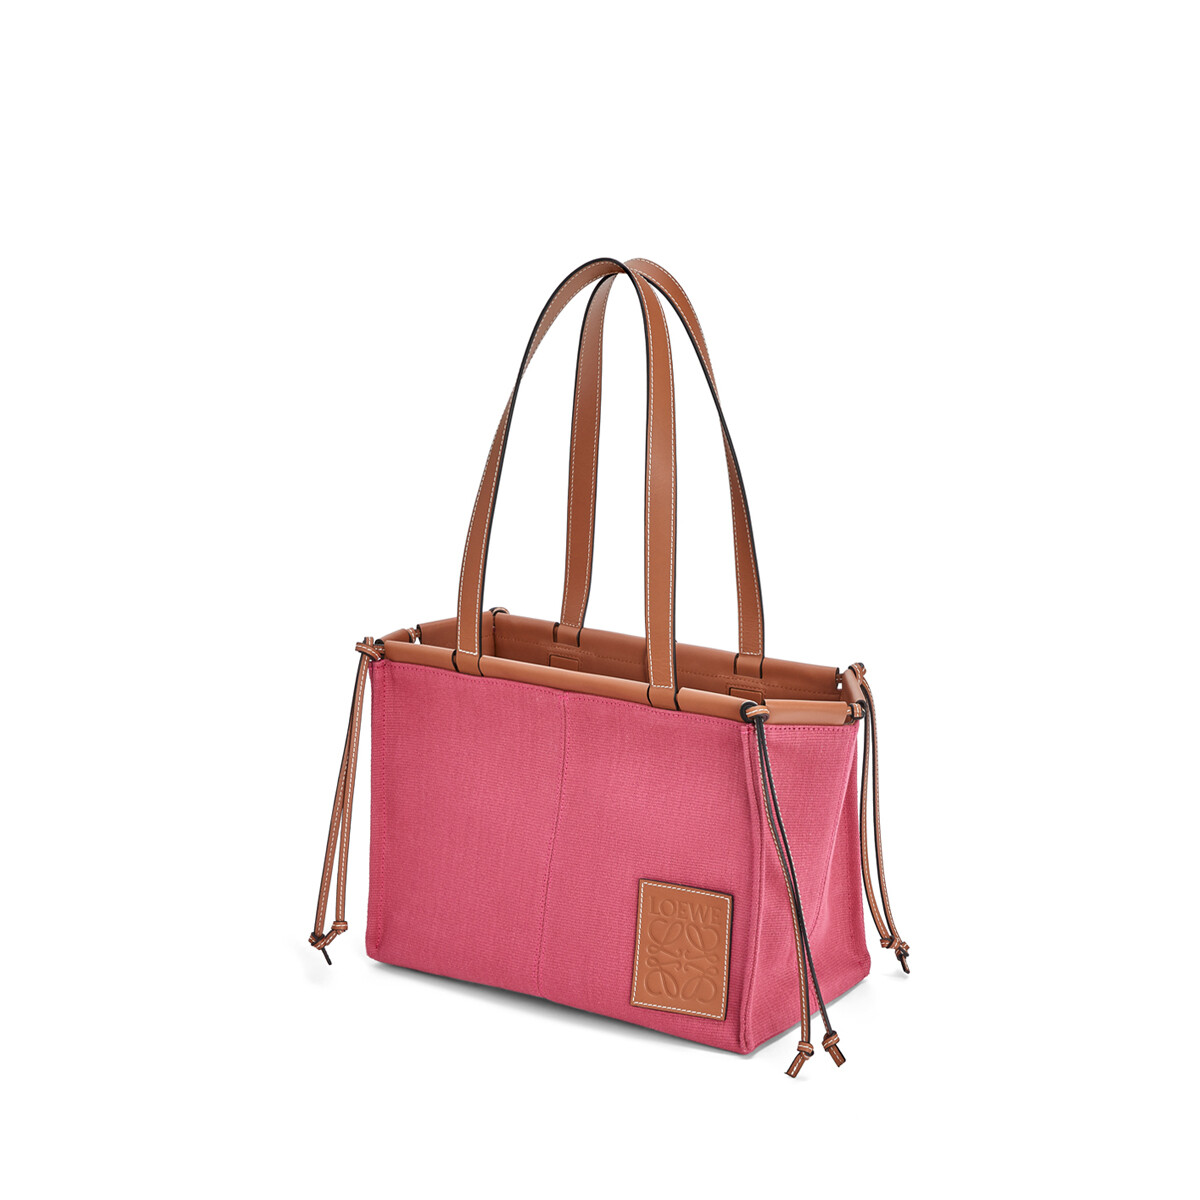 LOEWE Cushion Tote Small Bag 覆盆子 front